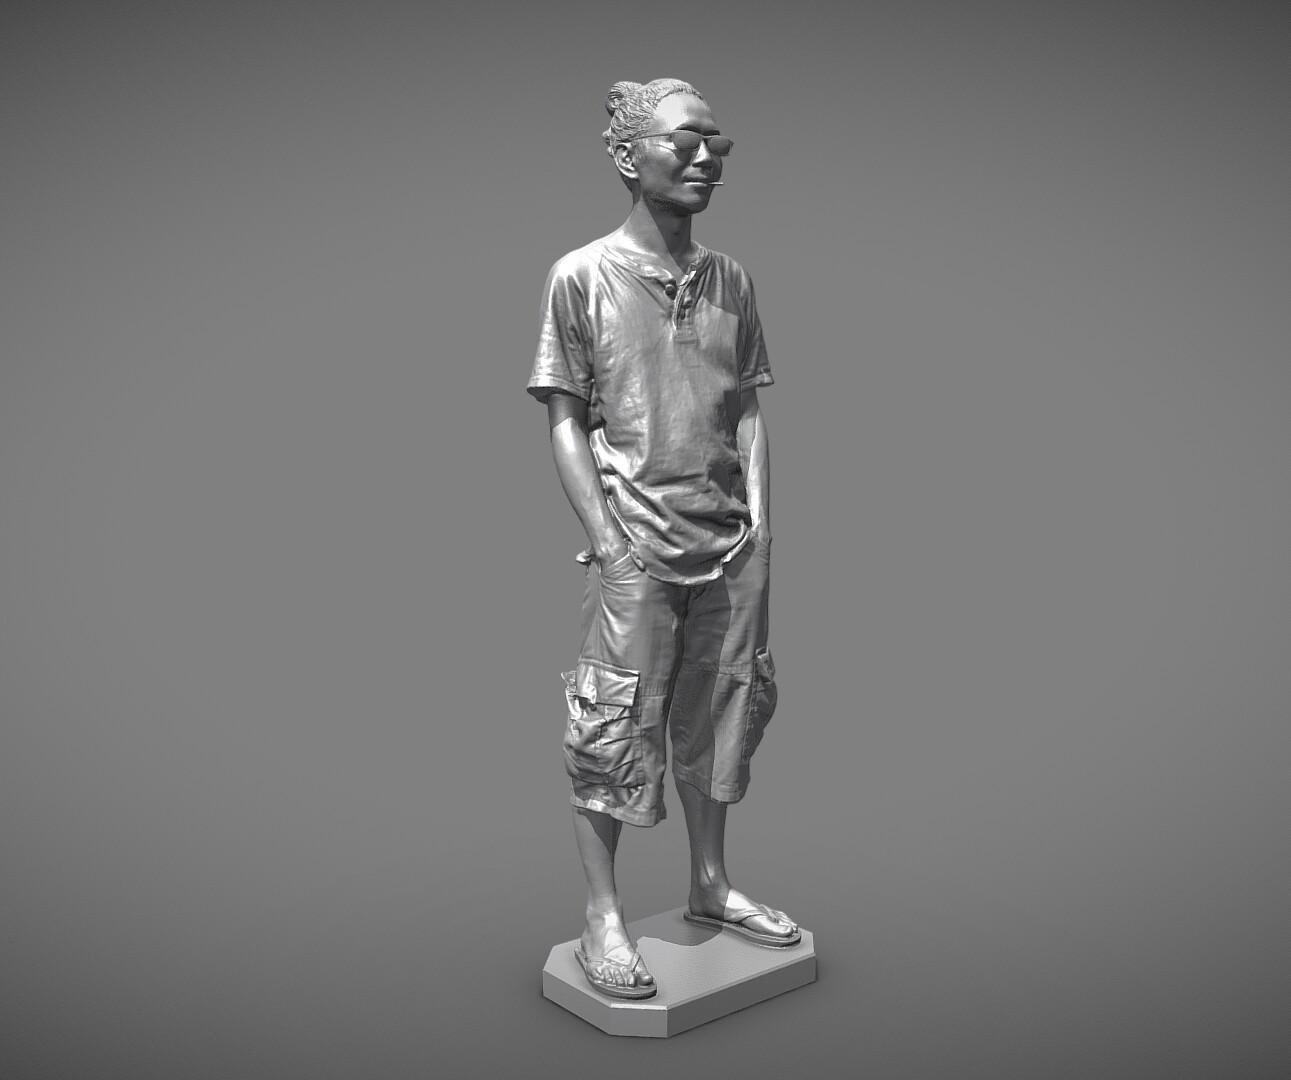 Michael wu 3d models by mwopus mwopus sketchfab20190320 007965